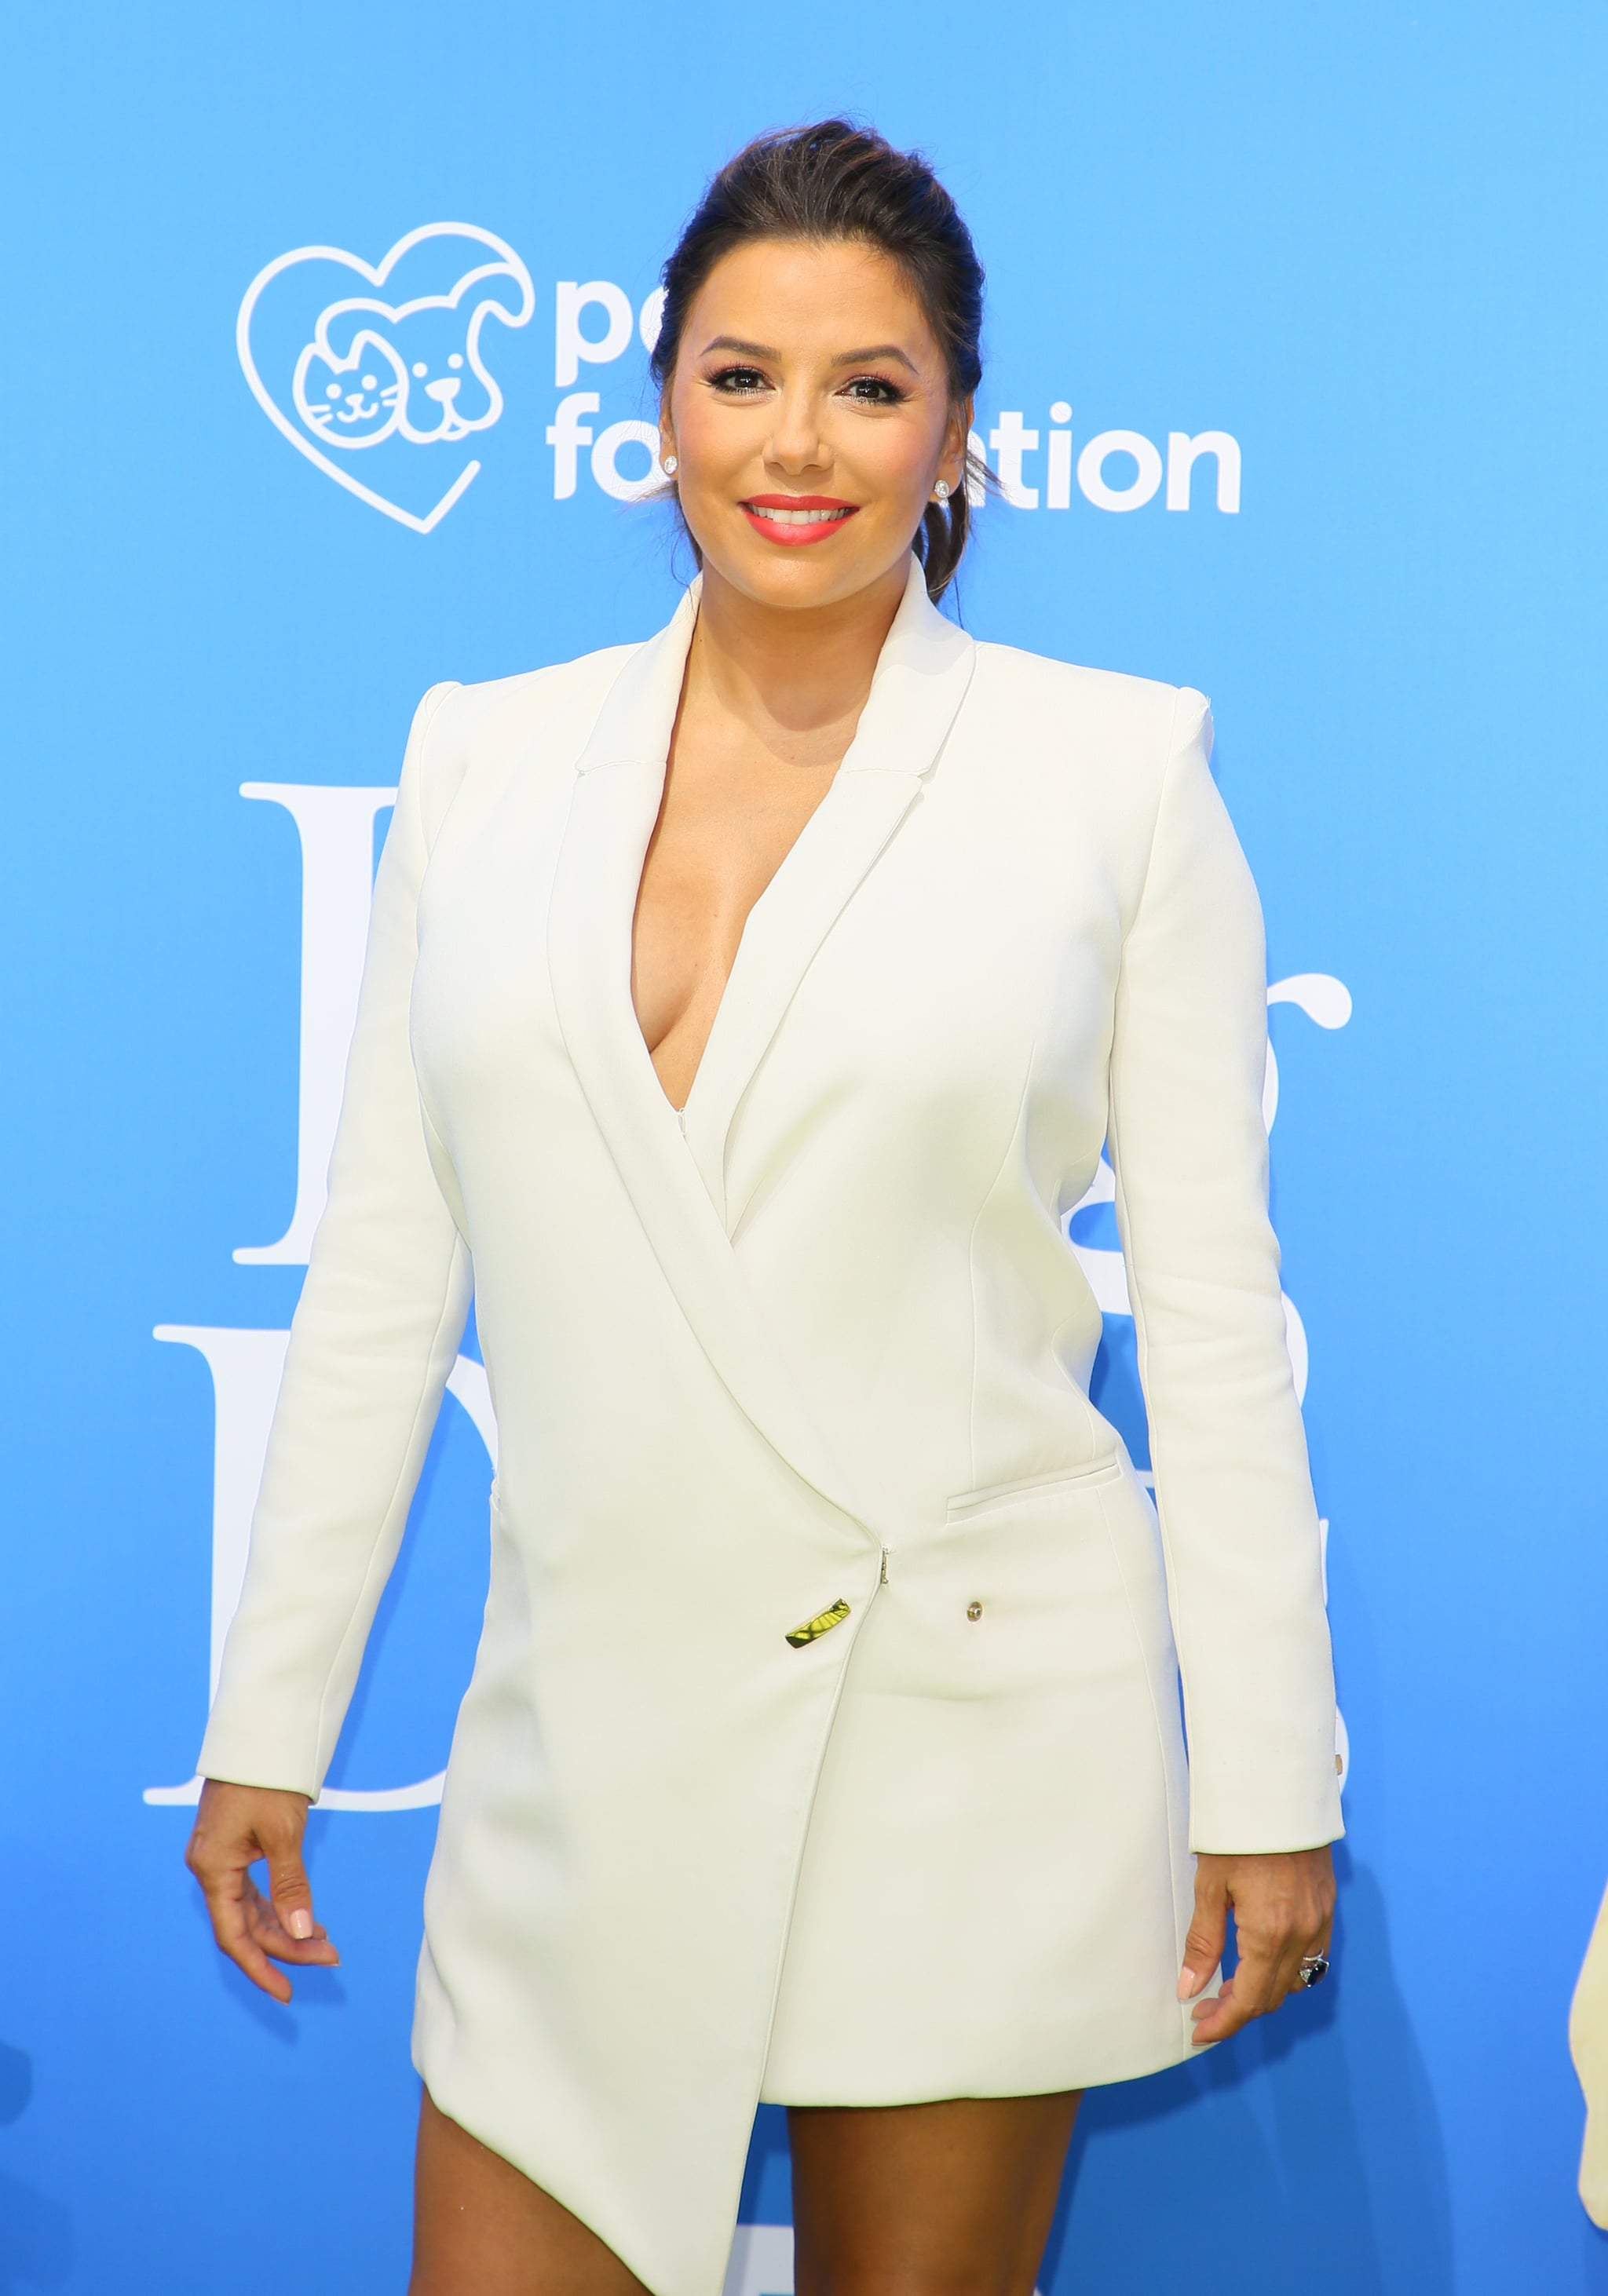 CENTURY CITY, CA - AUGUST 05:  Eva Longoria attends the premiere of LD Entertainment's